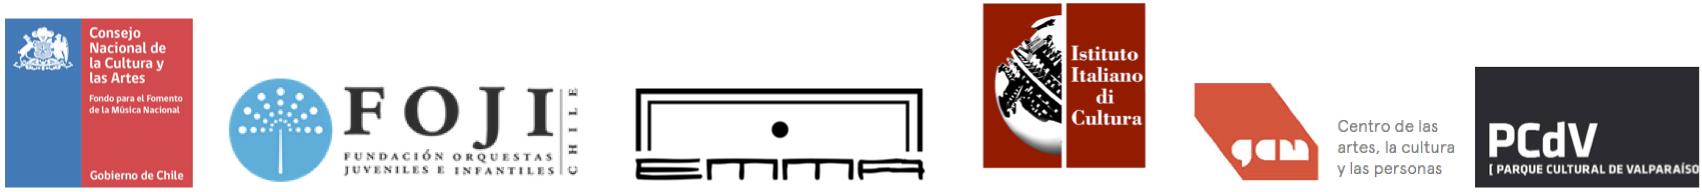 logos de auspiciadores grandes